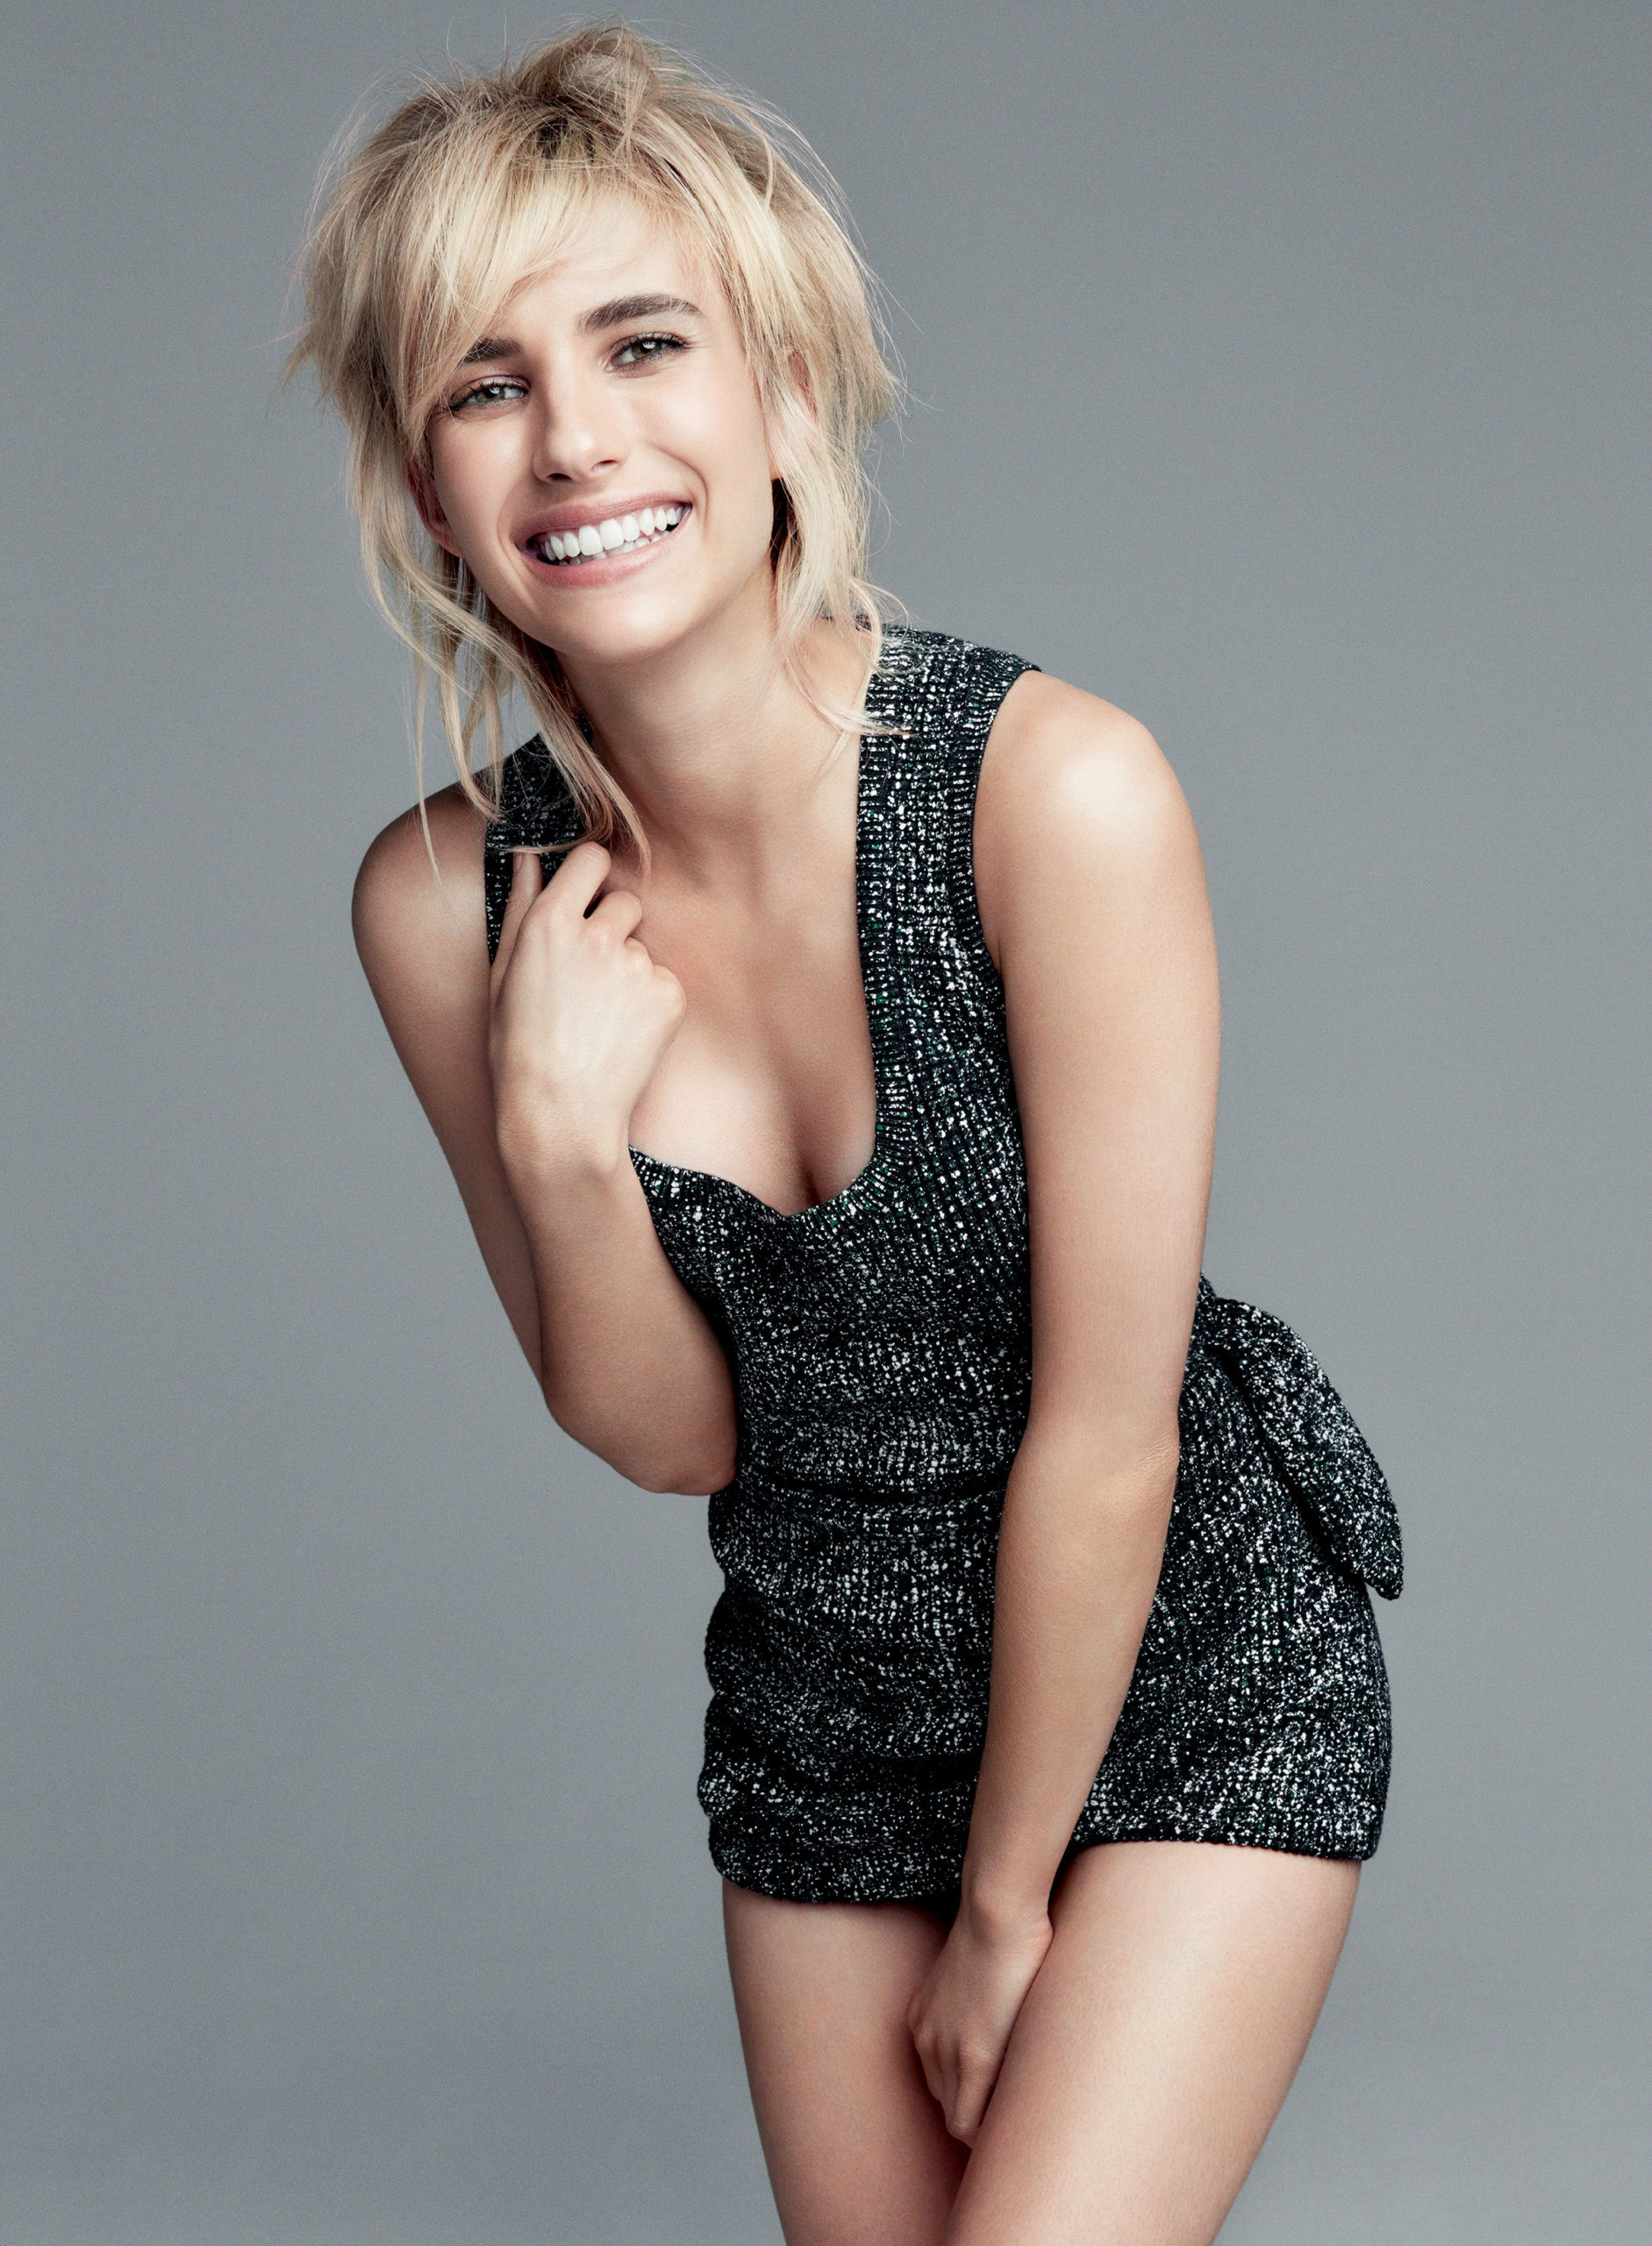 Emma Roberts hot cleavage